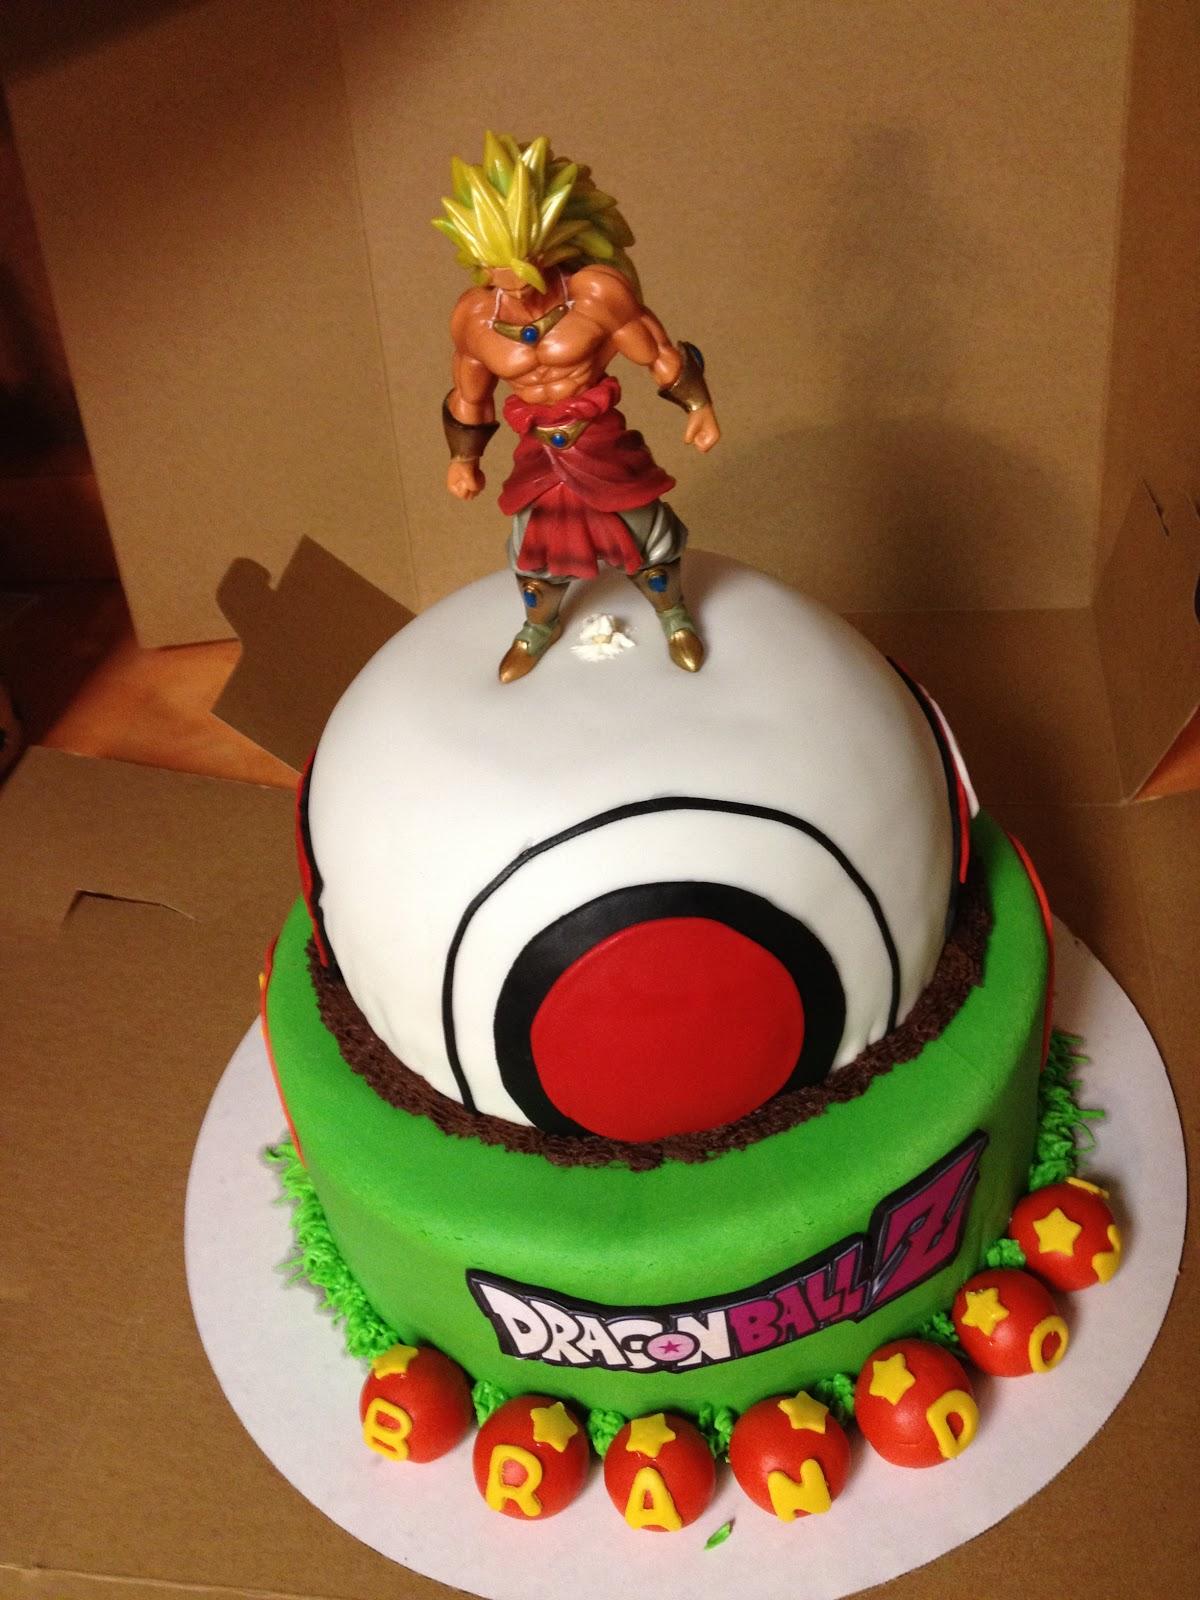 Love To Bake Drazon Ball Z Cake